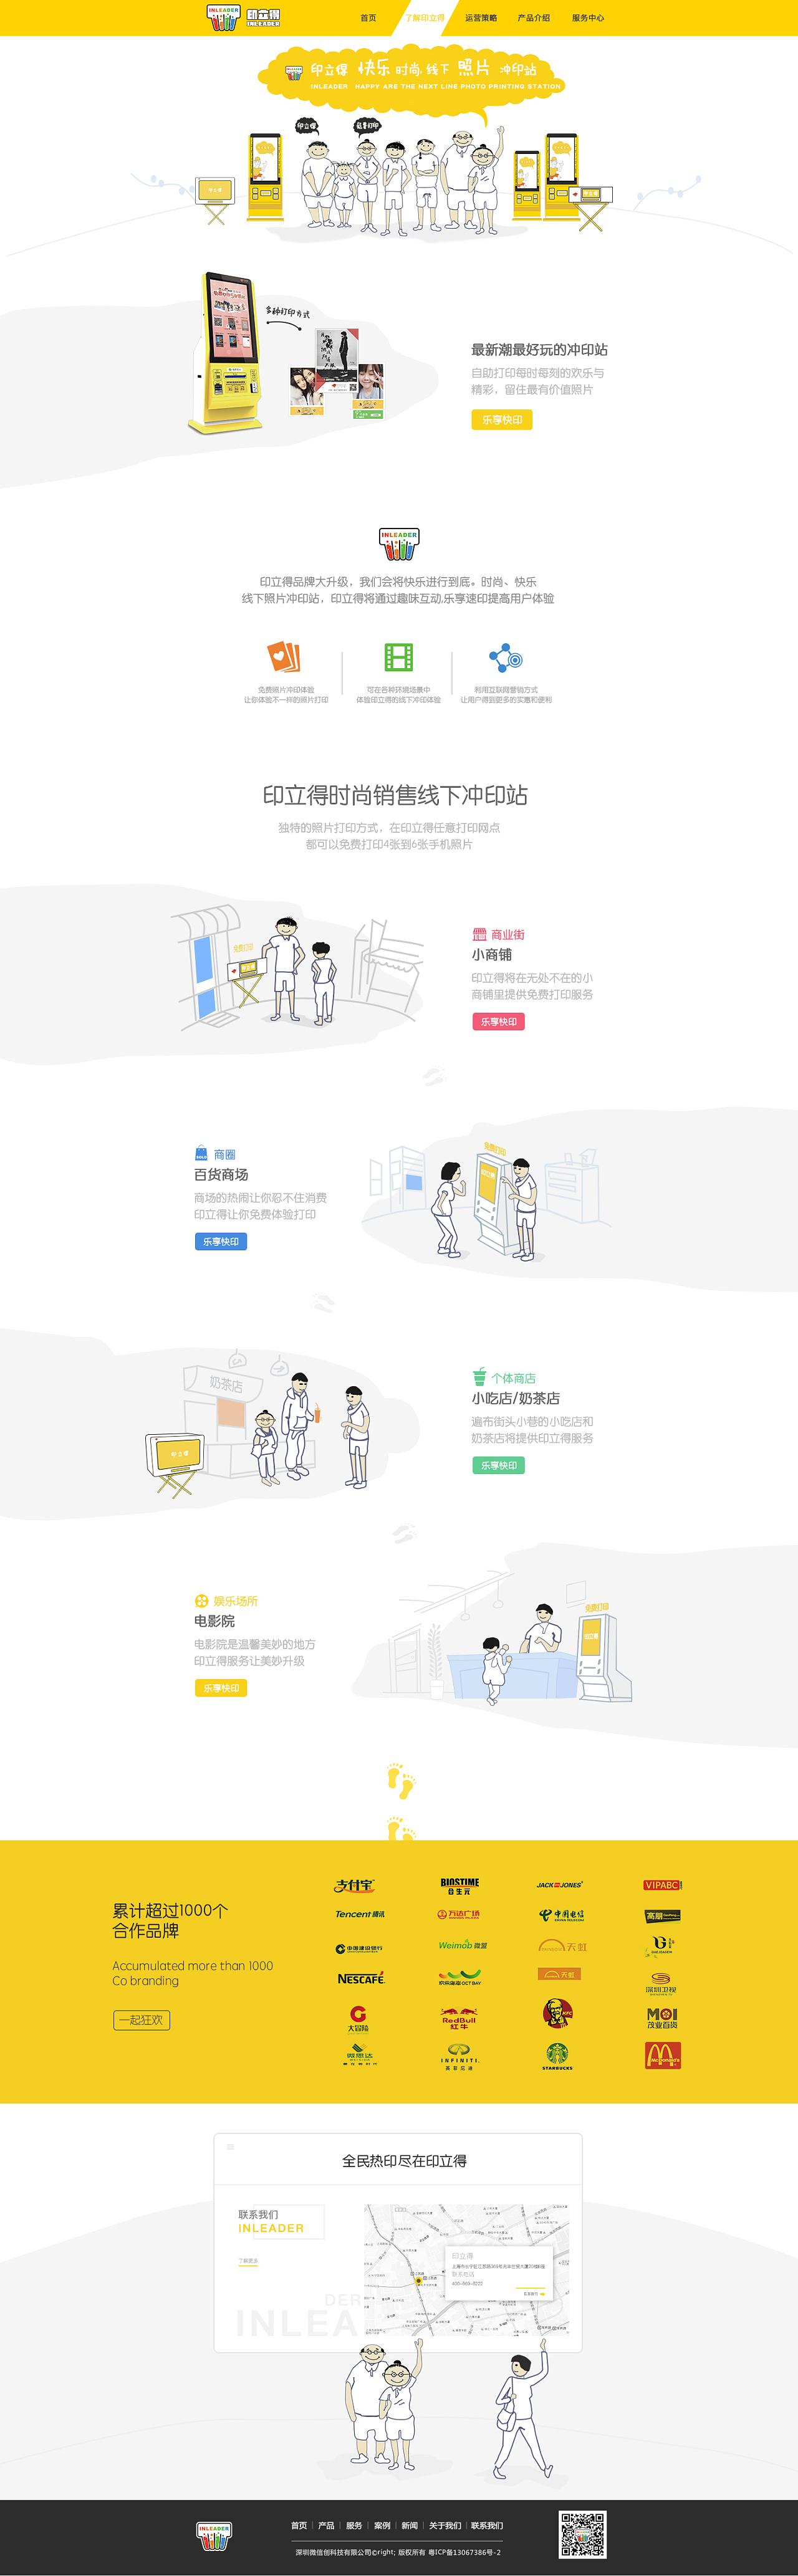 inleader web design 网页设计 vi品牌升级 卡通人物形象绘制图片